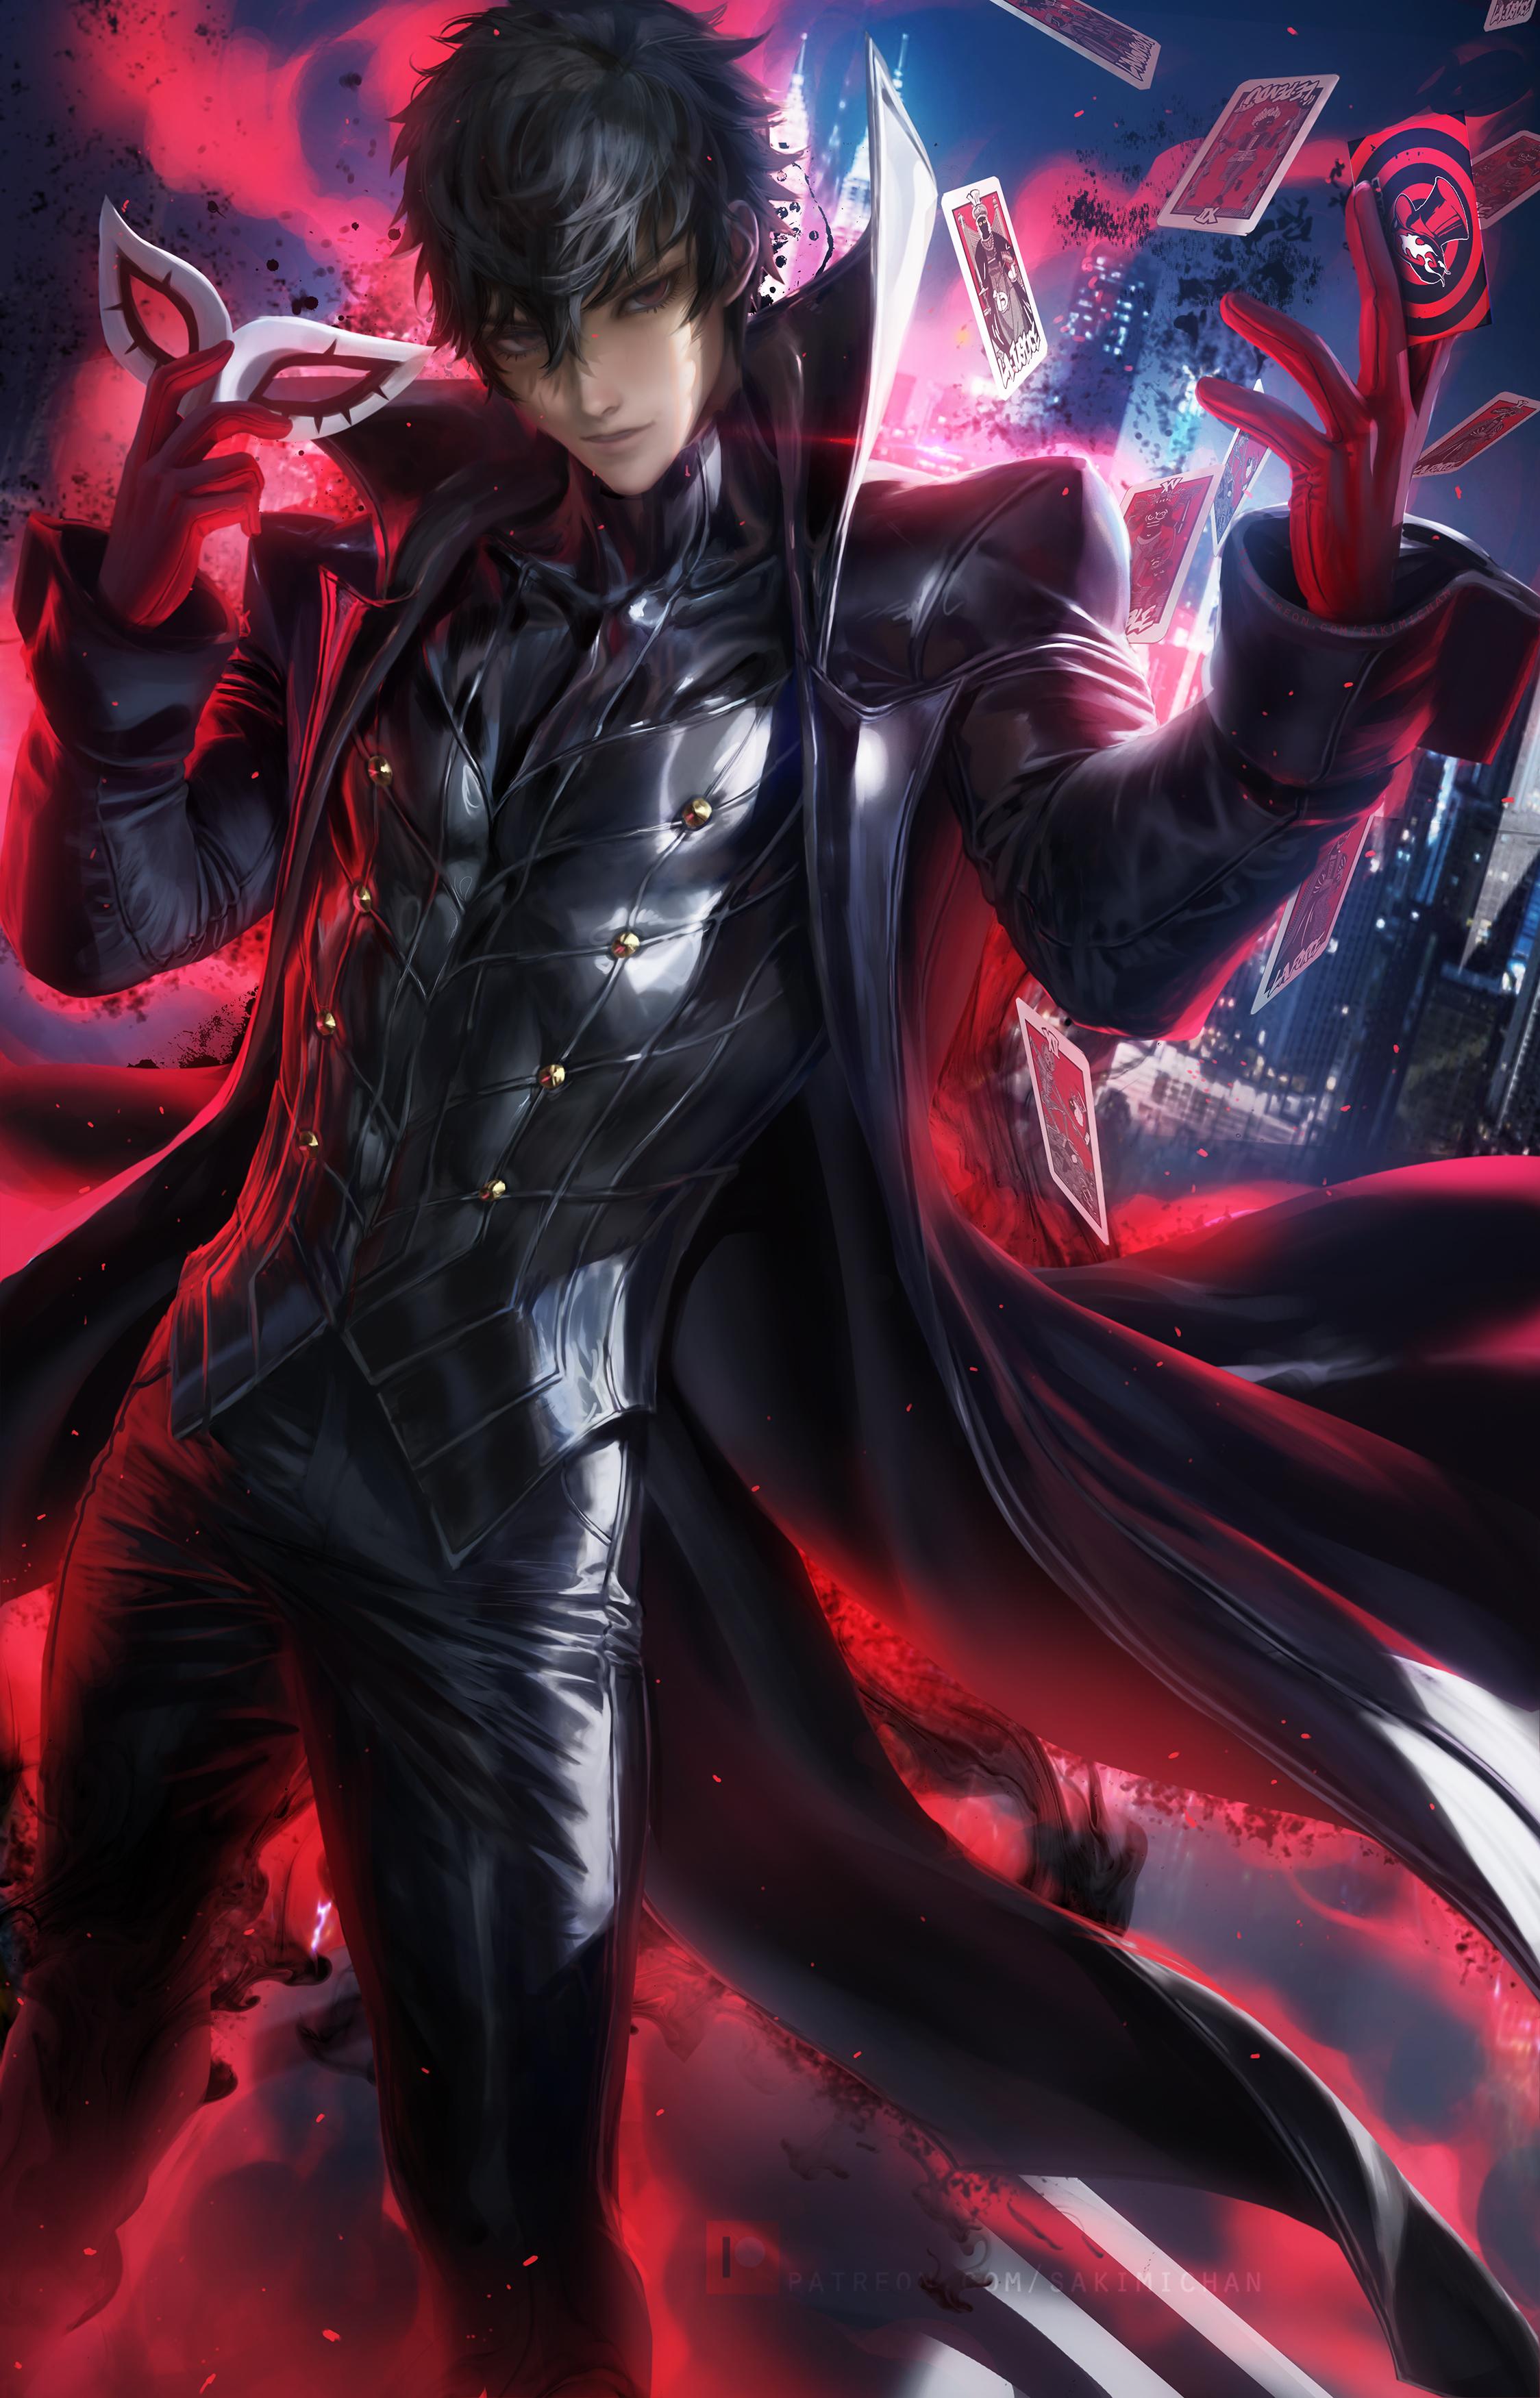 Joker (Persona 5) - Amamiya Ren (Persona 5) - Image #2565432